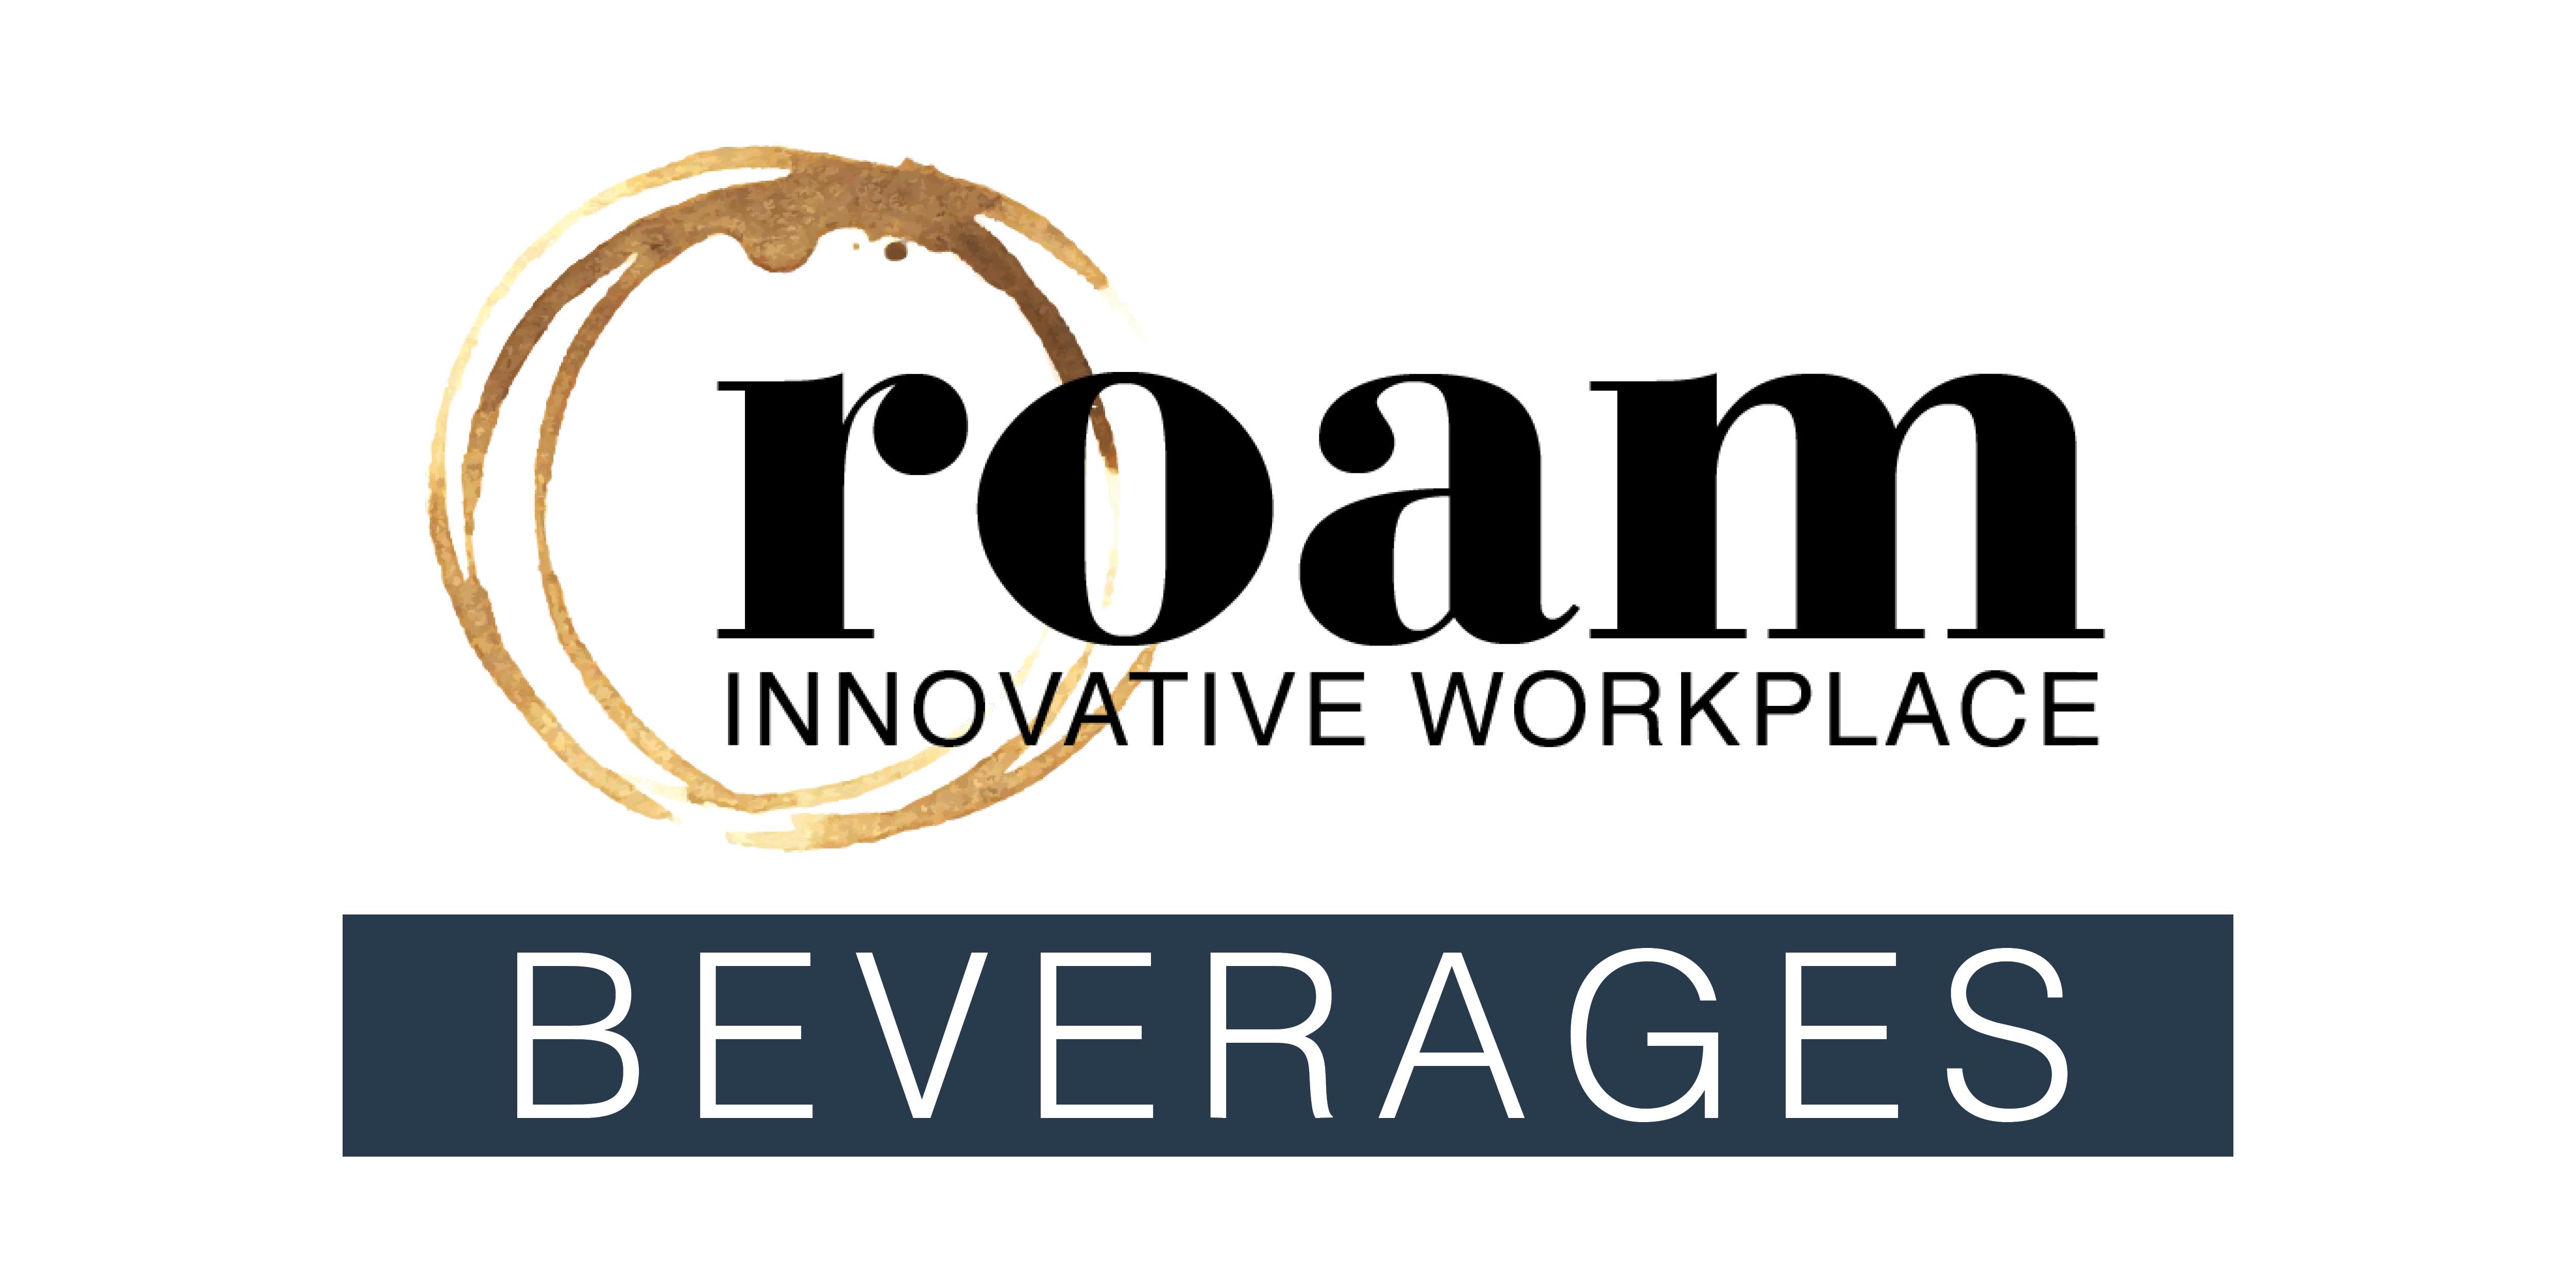 Roam Beverages_Catering_Website logo